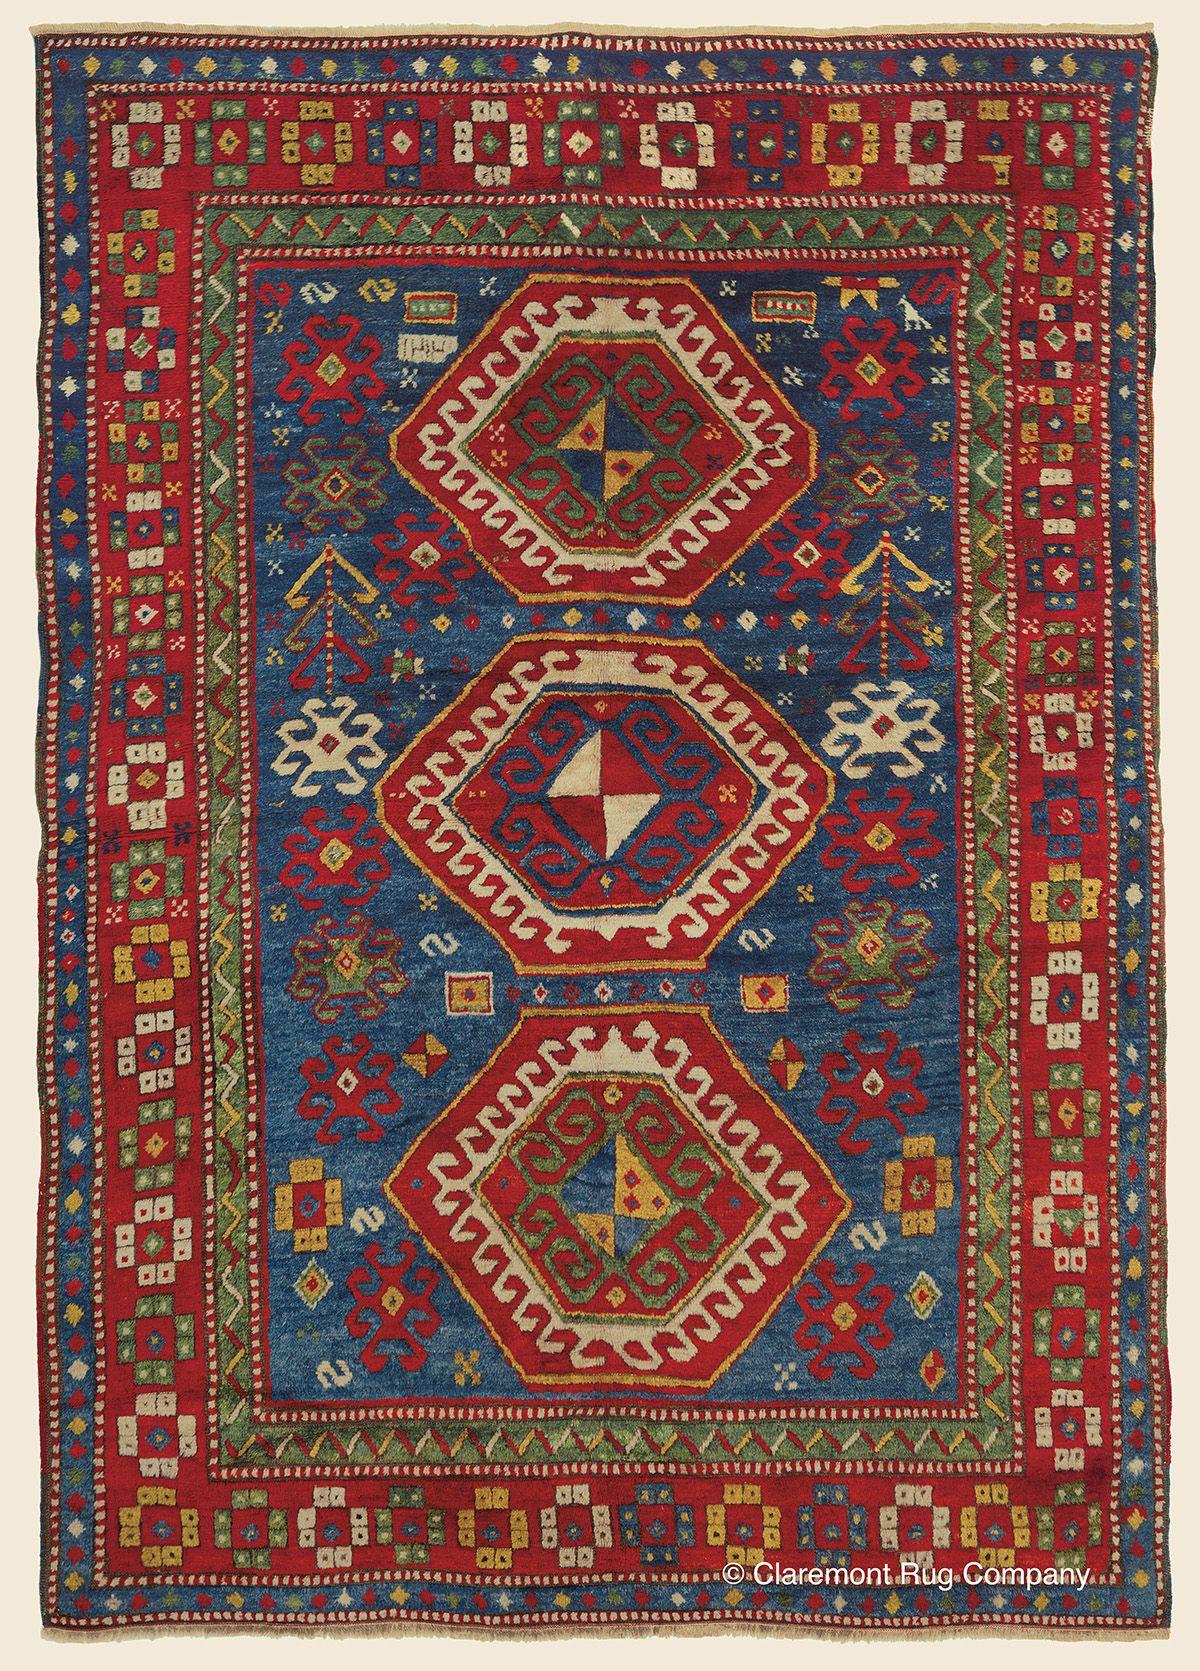 Bordjalou Kazak Southeast Caucasian Antique Rug 5 4 X 7 10 Dated 1894 Claremont Rug Company Antique Persian Carpet Rugs On Carpet Carpet Handmade